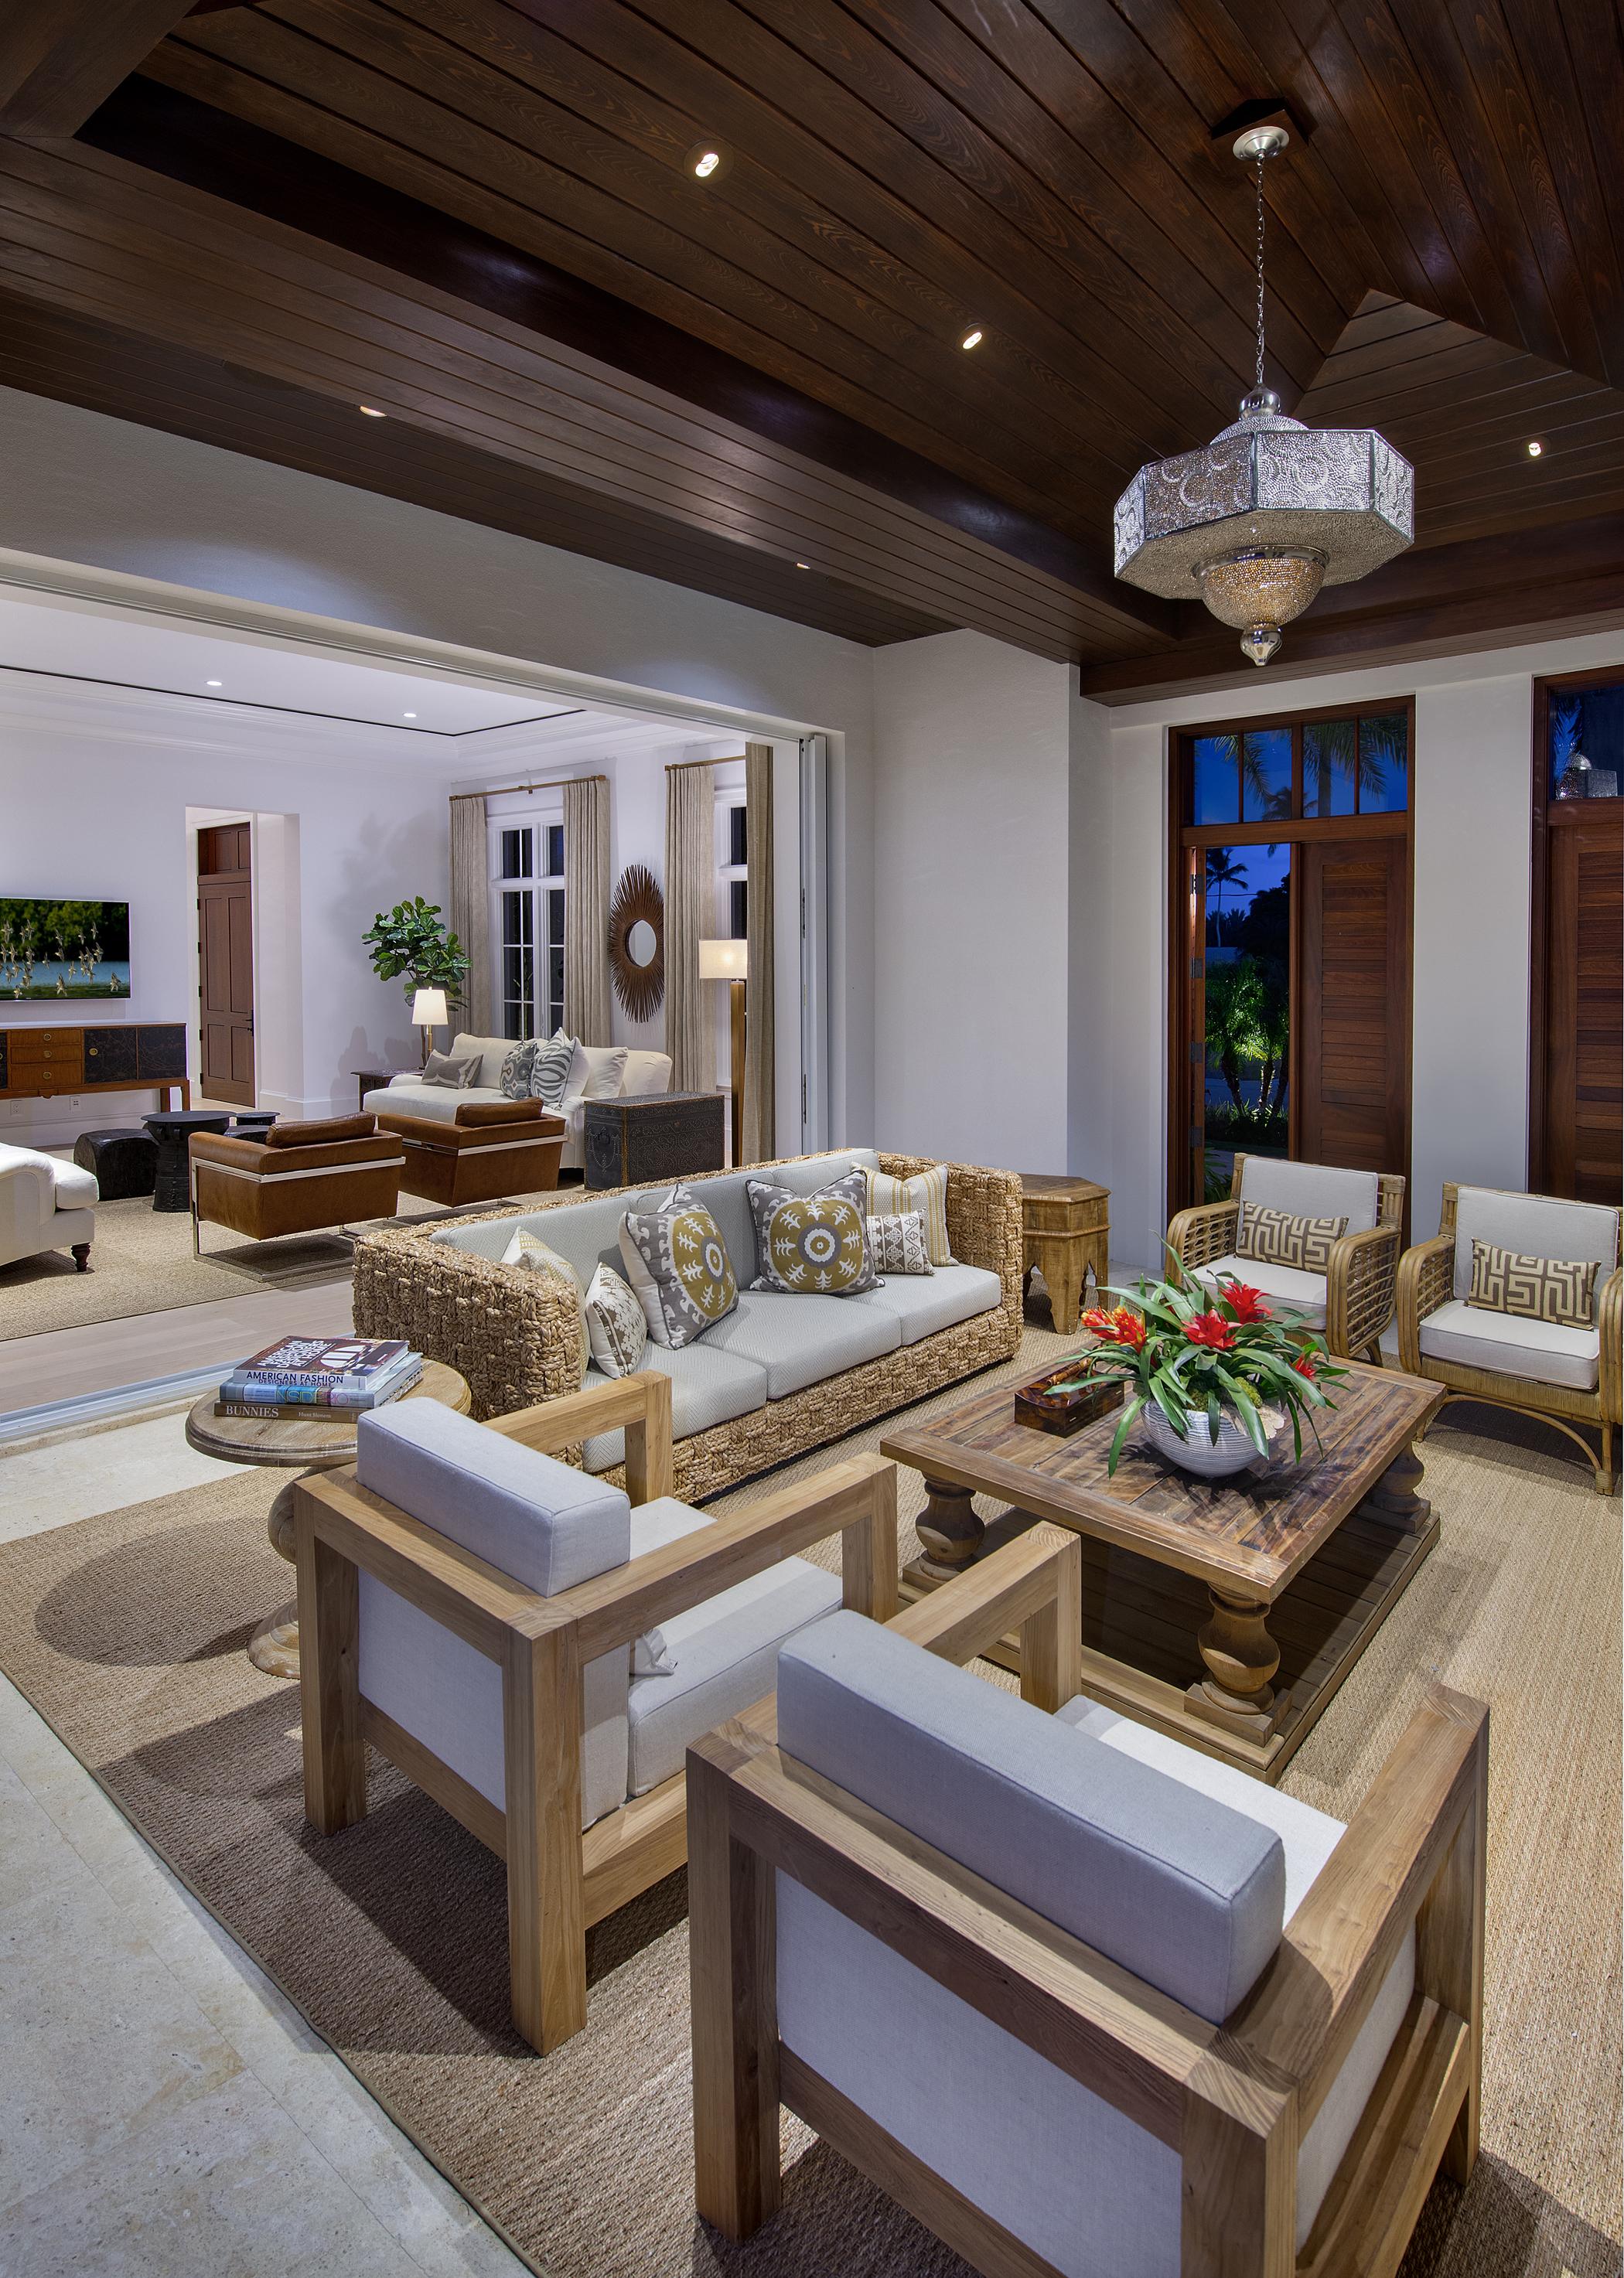 Jeffrey Fisher Home Luxury Interior Design Imagined Home Decor Sun Room